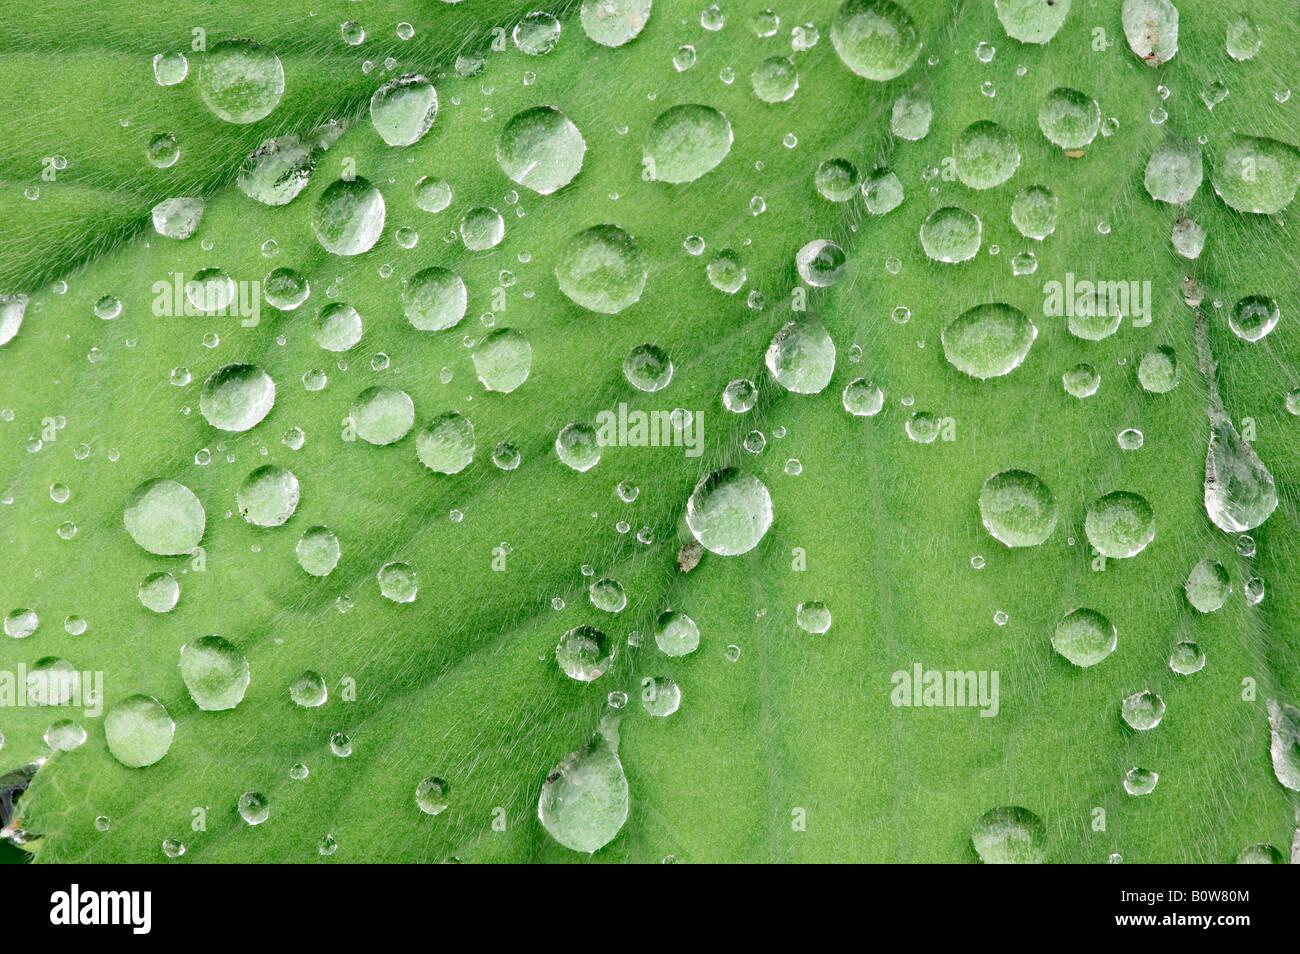 Lady's Mantle (Alchemilla mollis), water drops on leaf - Stock Image